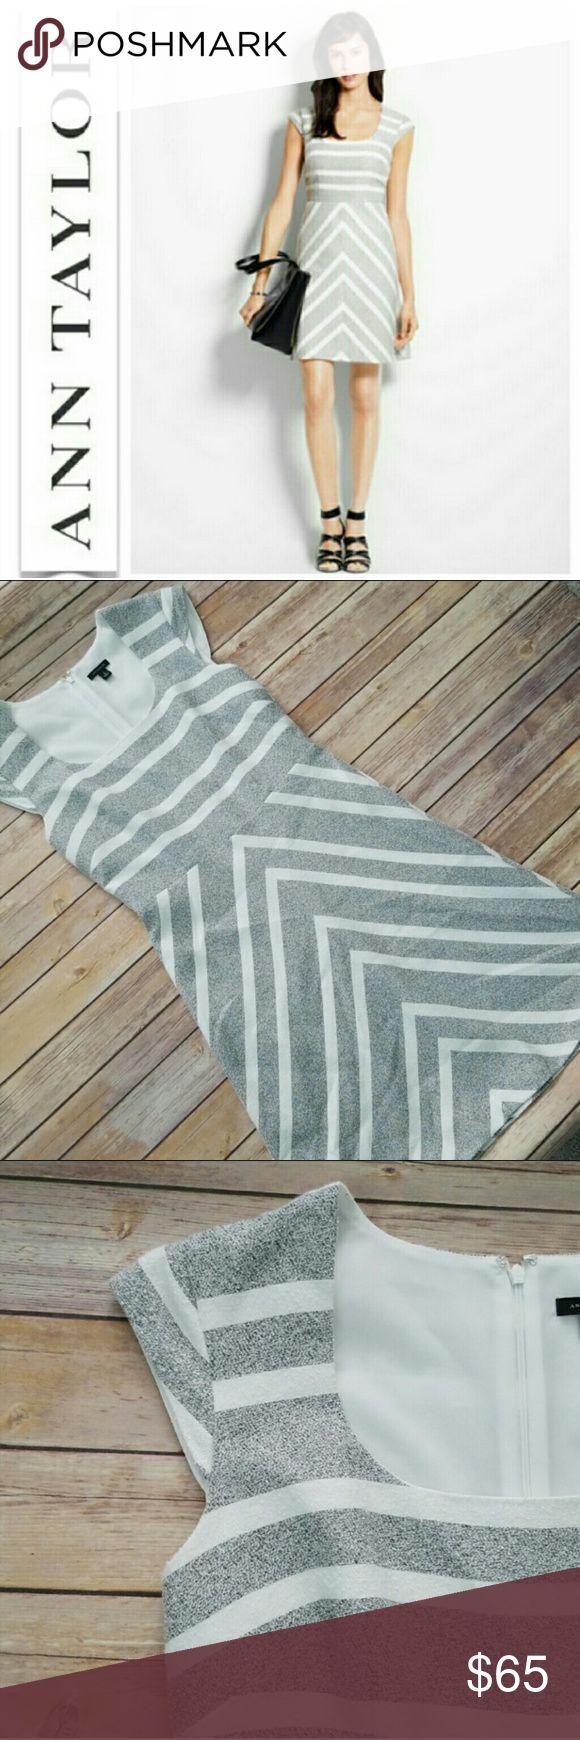 Ann Taylor Gray Amp White Striped Chevron Dress Gray And